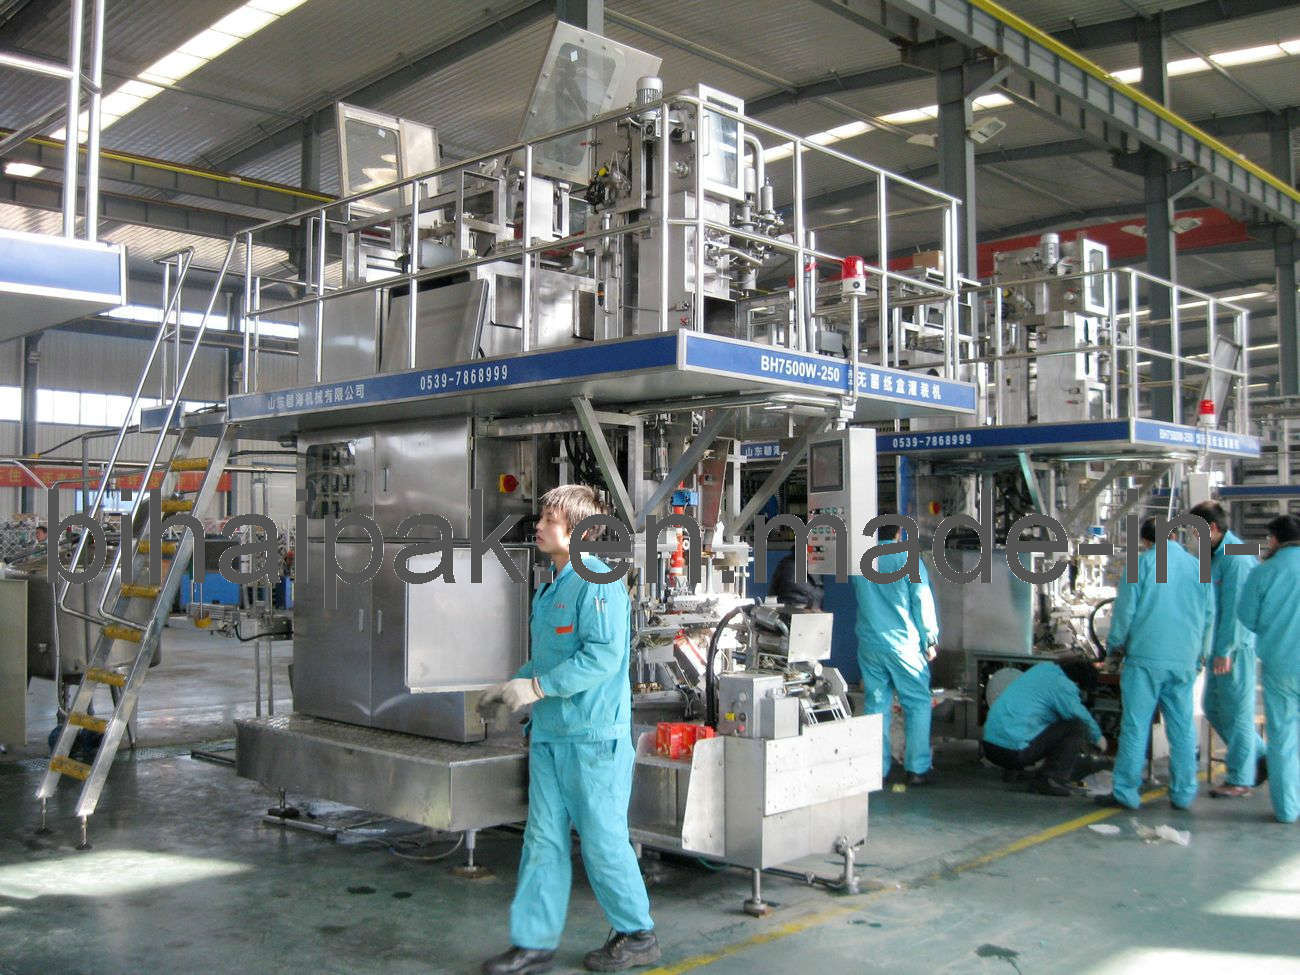 Atuomatic Filling Machine Same as Tera Pak